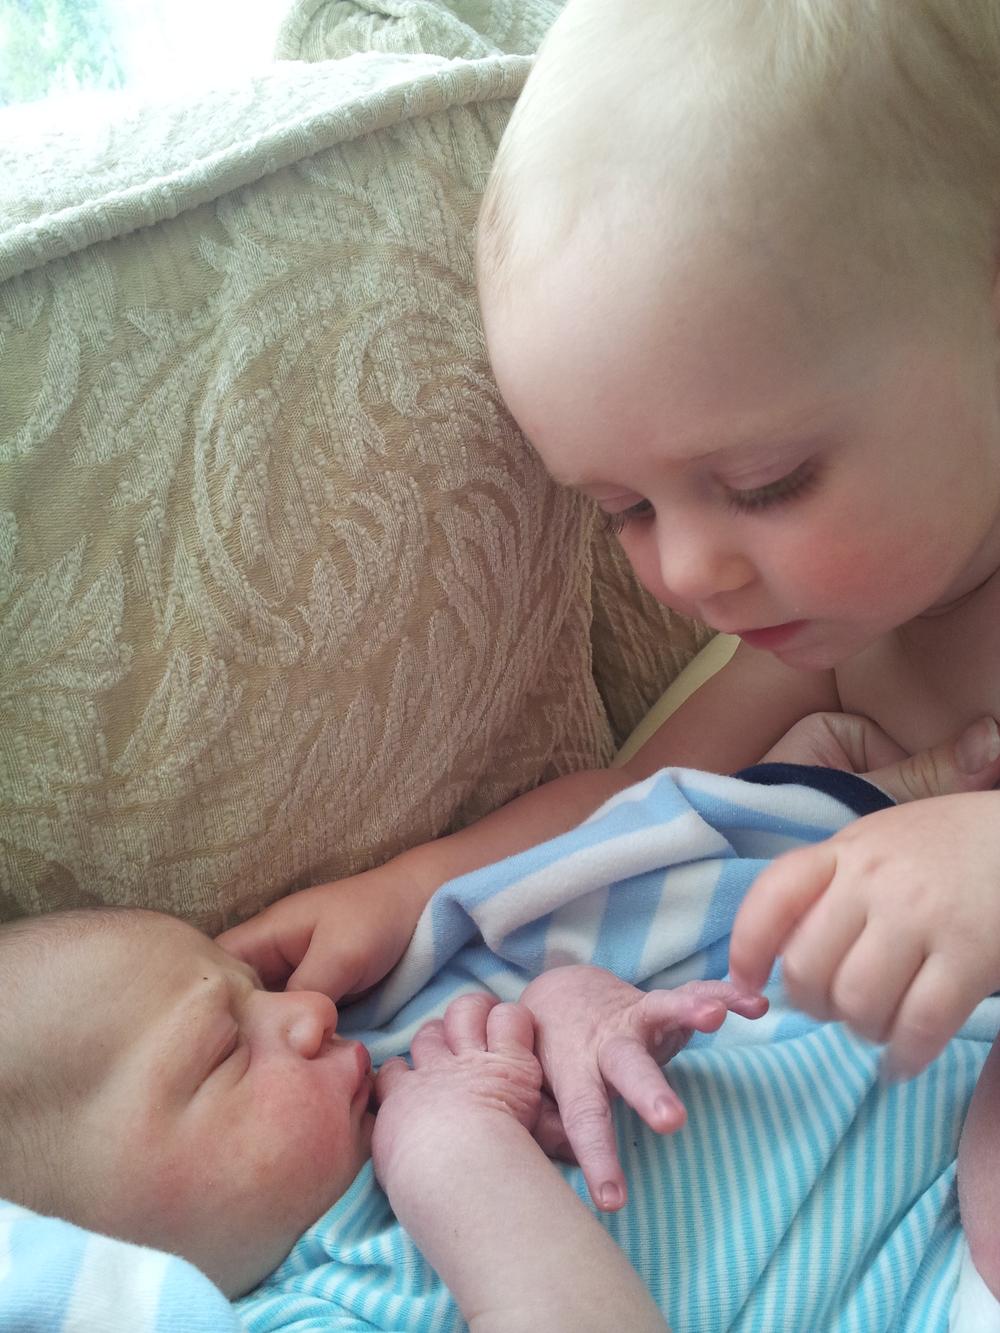 Baby with Newborn